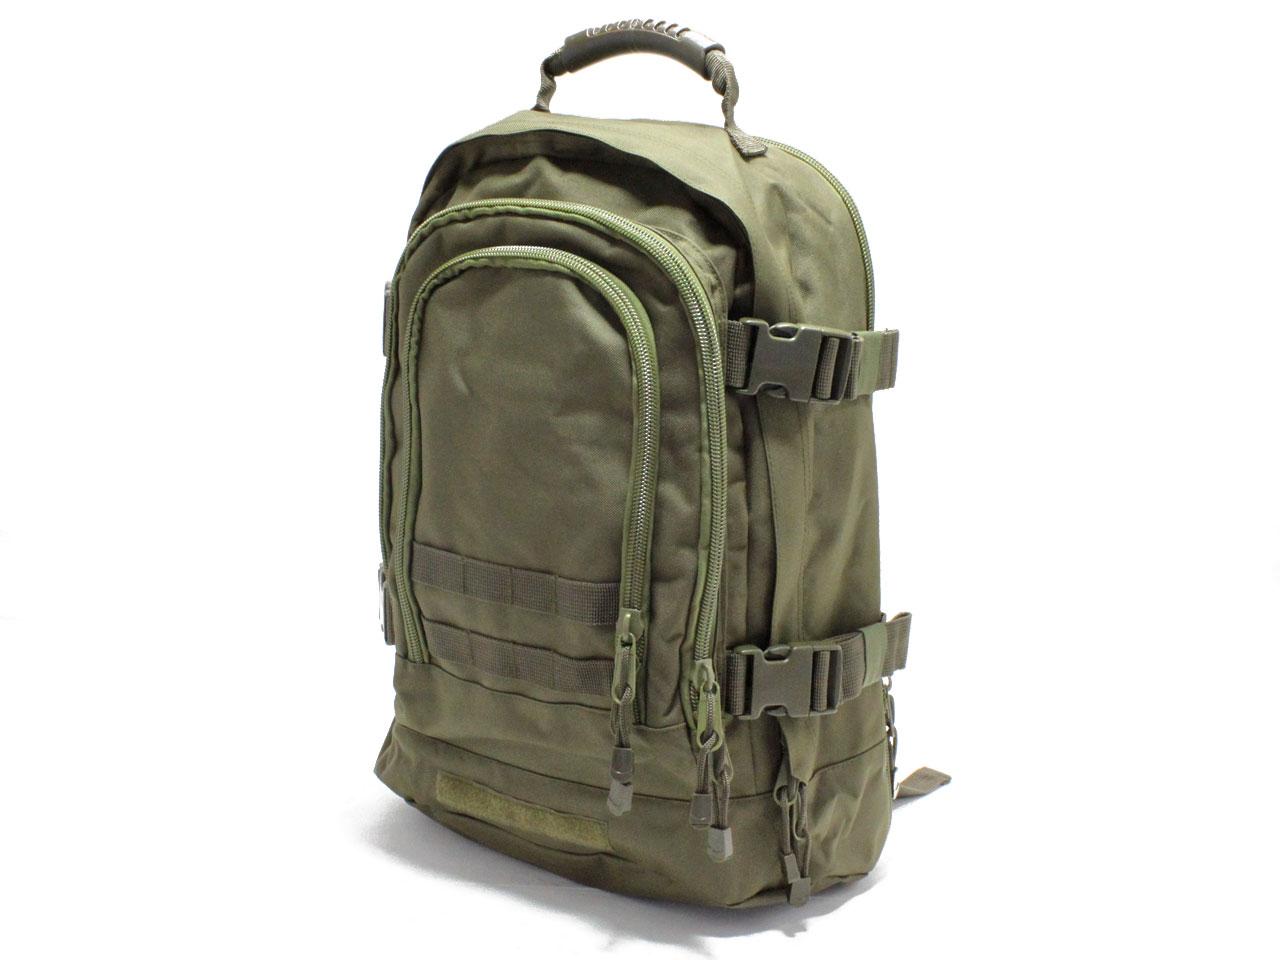 MILITARY【ミリタリー】U.S. MADE NATIONAL GUARD BAG *OLIVE